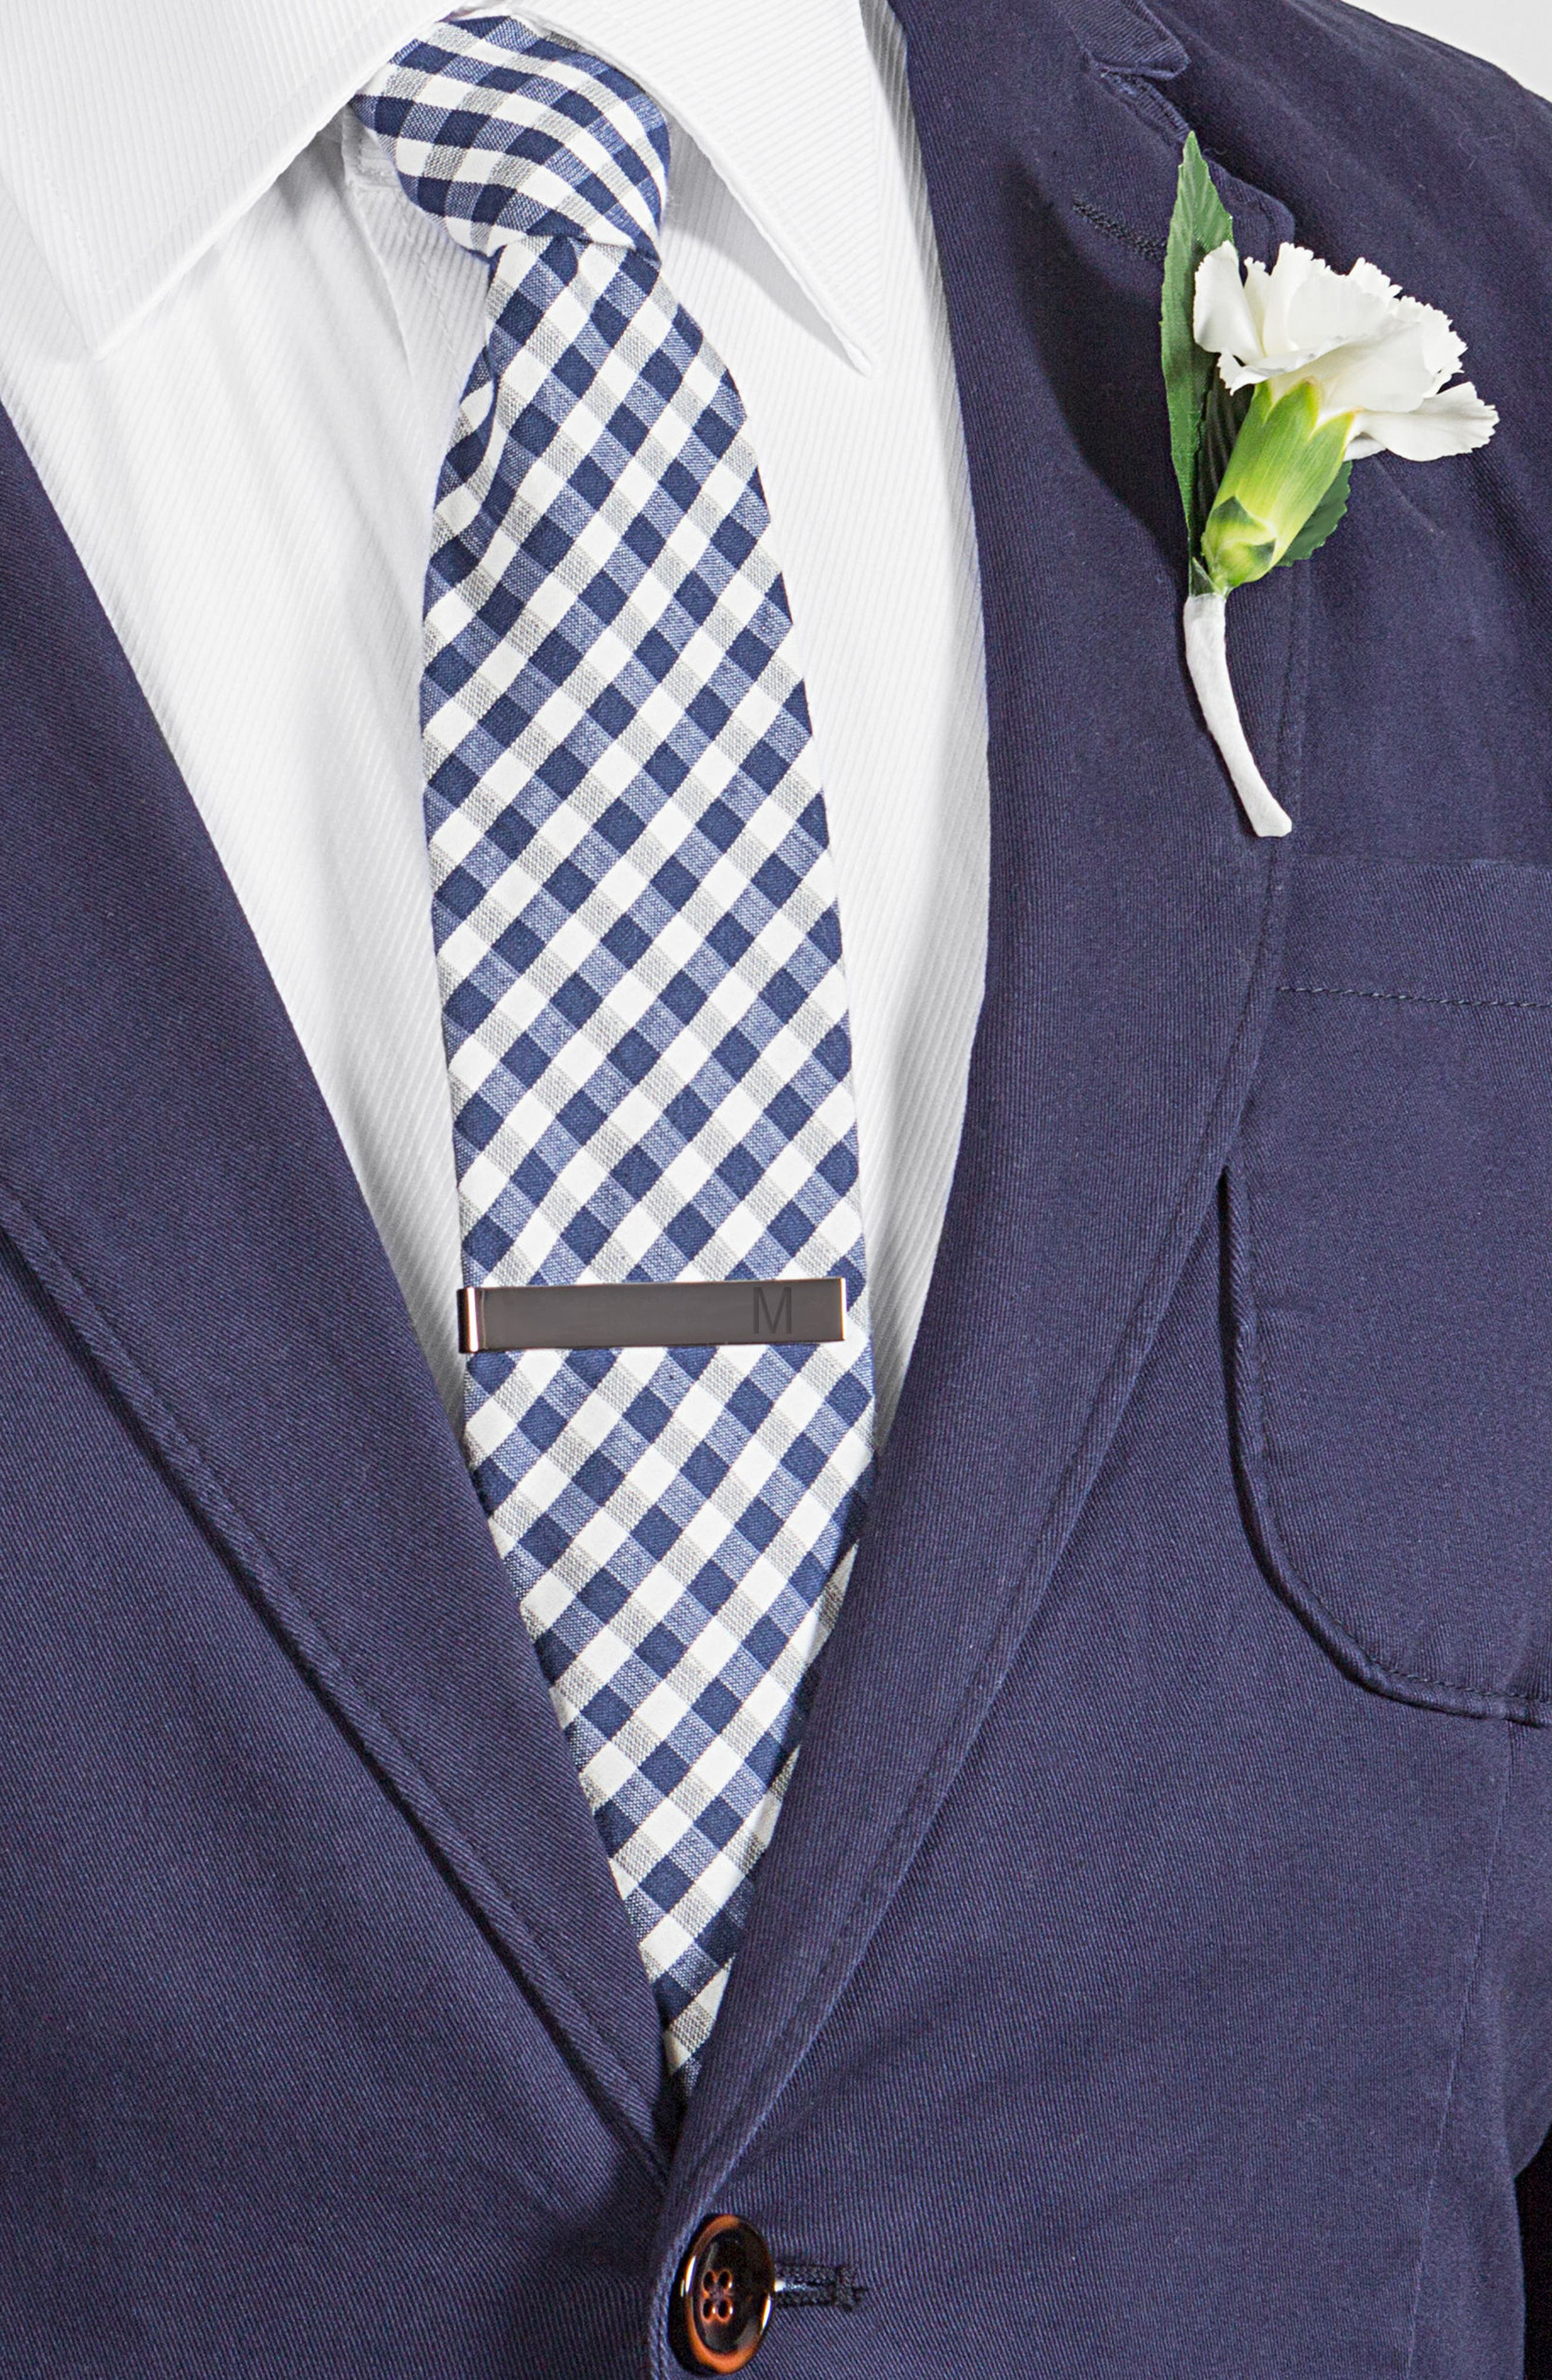 Monogram Tie Clip,                             Alternate thumbnail 3, color,                             GREY